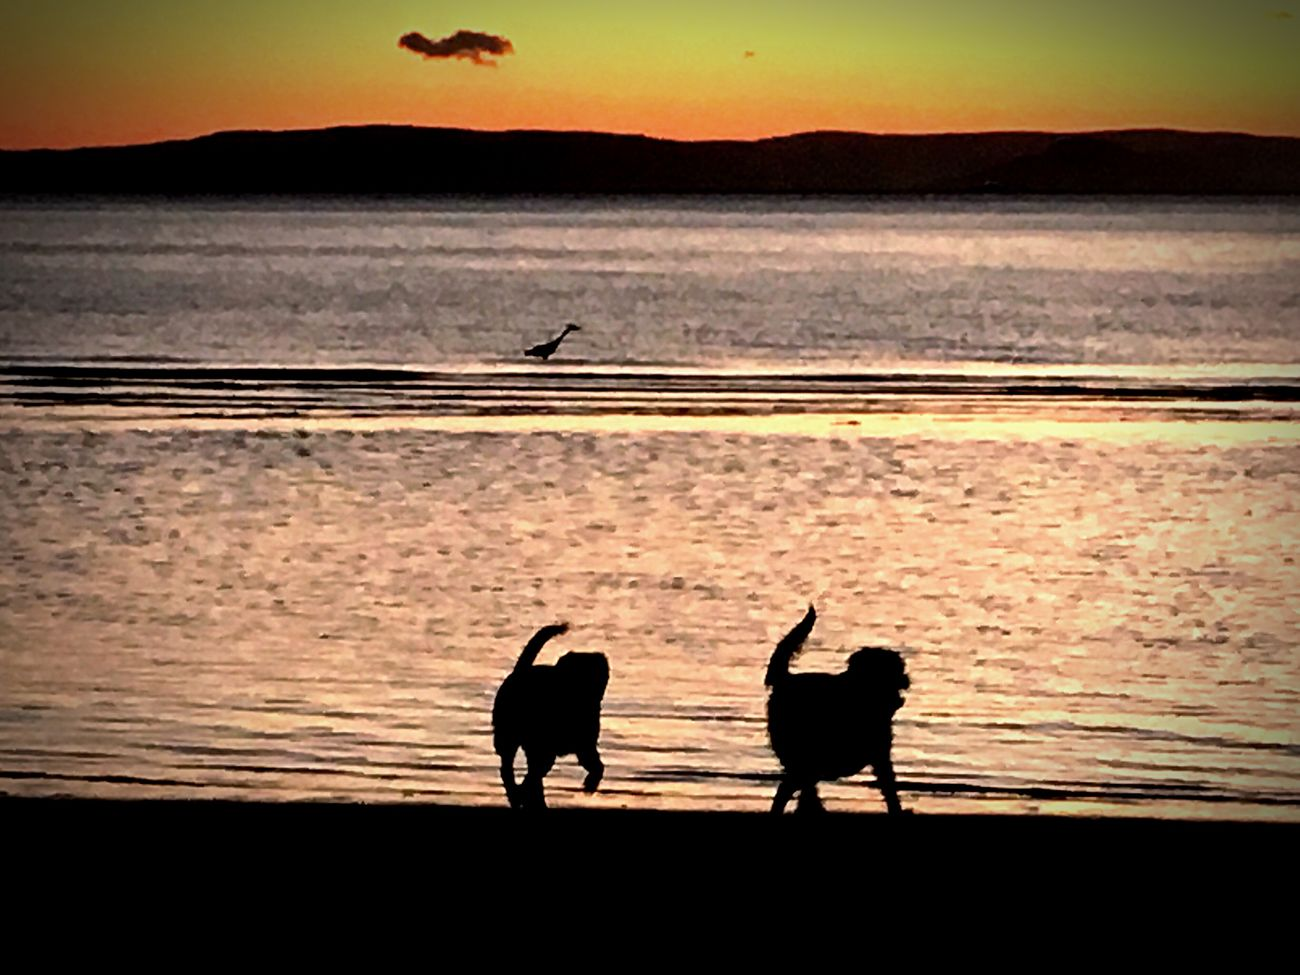 Water Sunset Silhouette Bird Nature Mansbestfriend Scenics Sea Doggos Scotland Isle Of Arran  Togetherness spot the heron Beachphotography